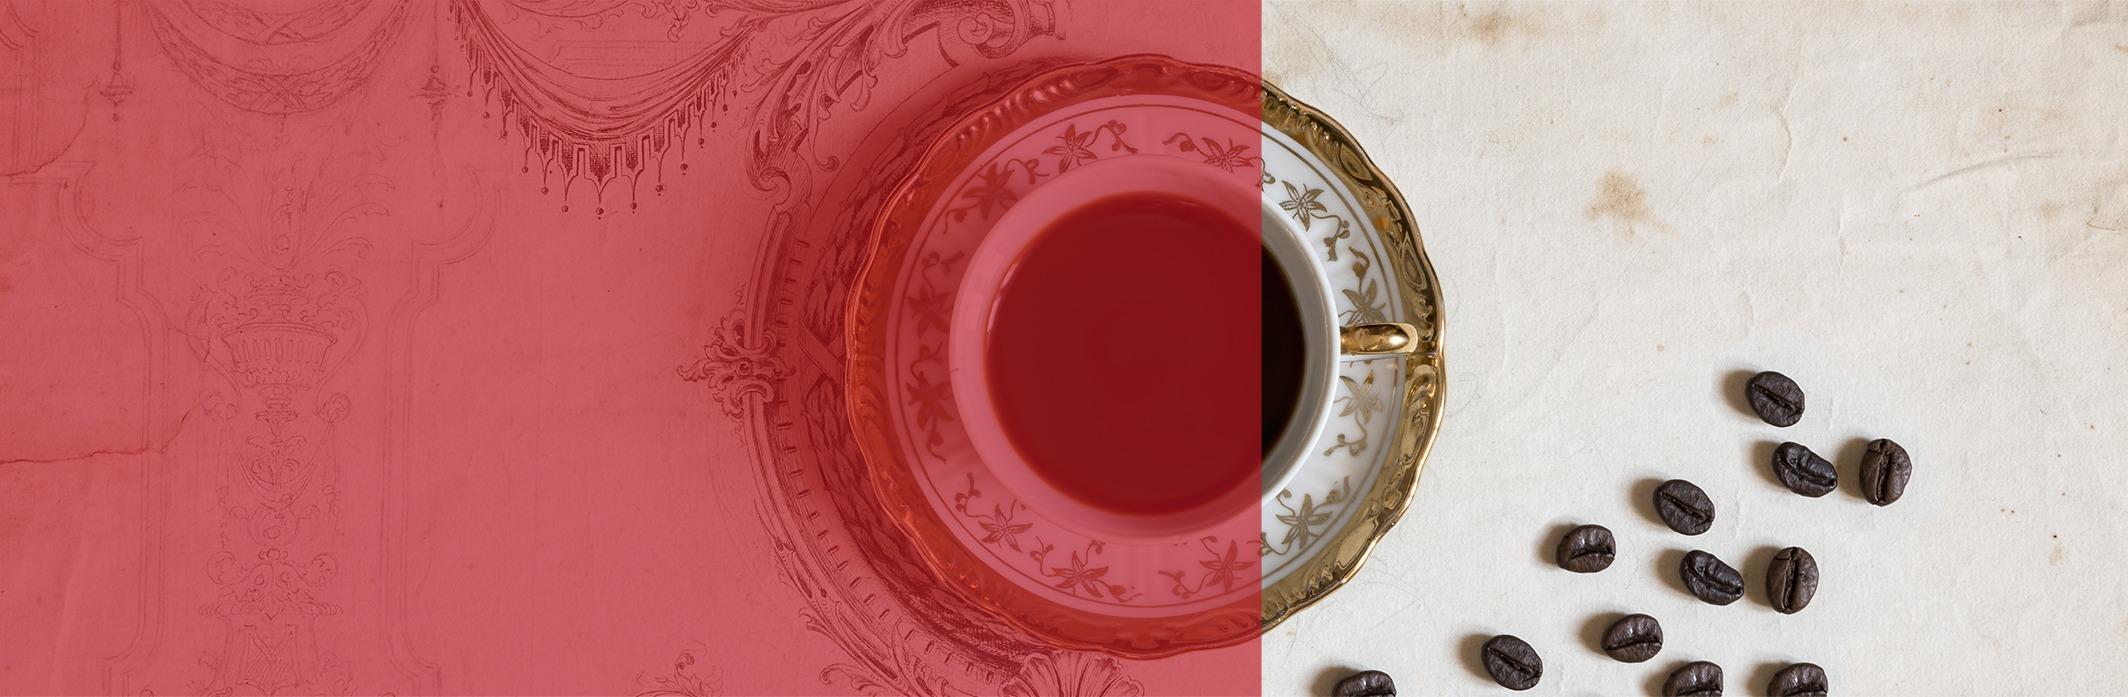 Caffà Malabar - La storia del caffè